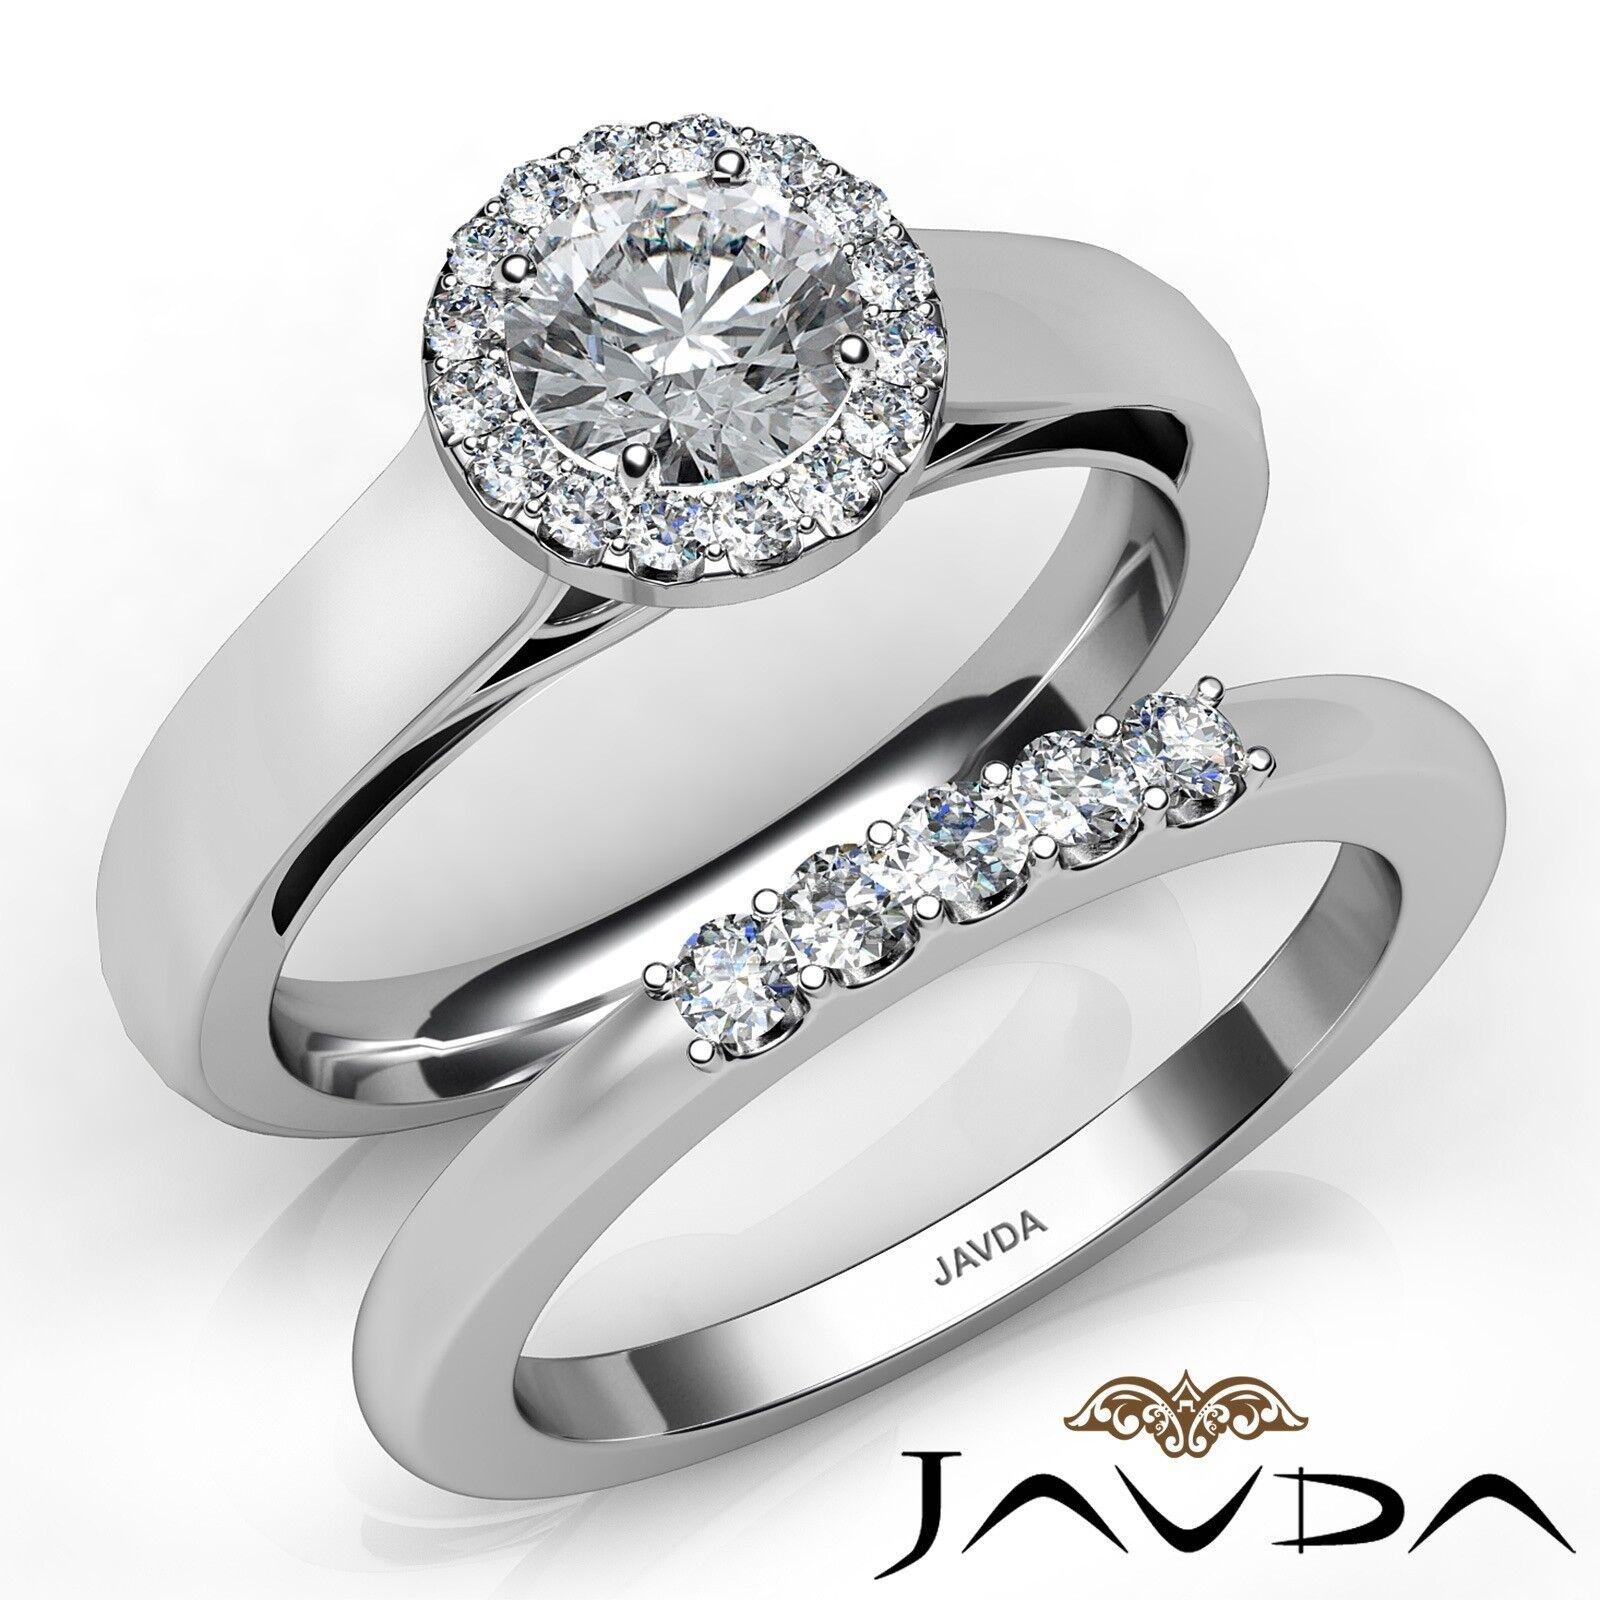 1.1ctw U Prong Halo Bridal Round Diamond Engagement Ring GIA F-VS1 White Gold